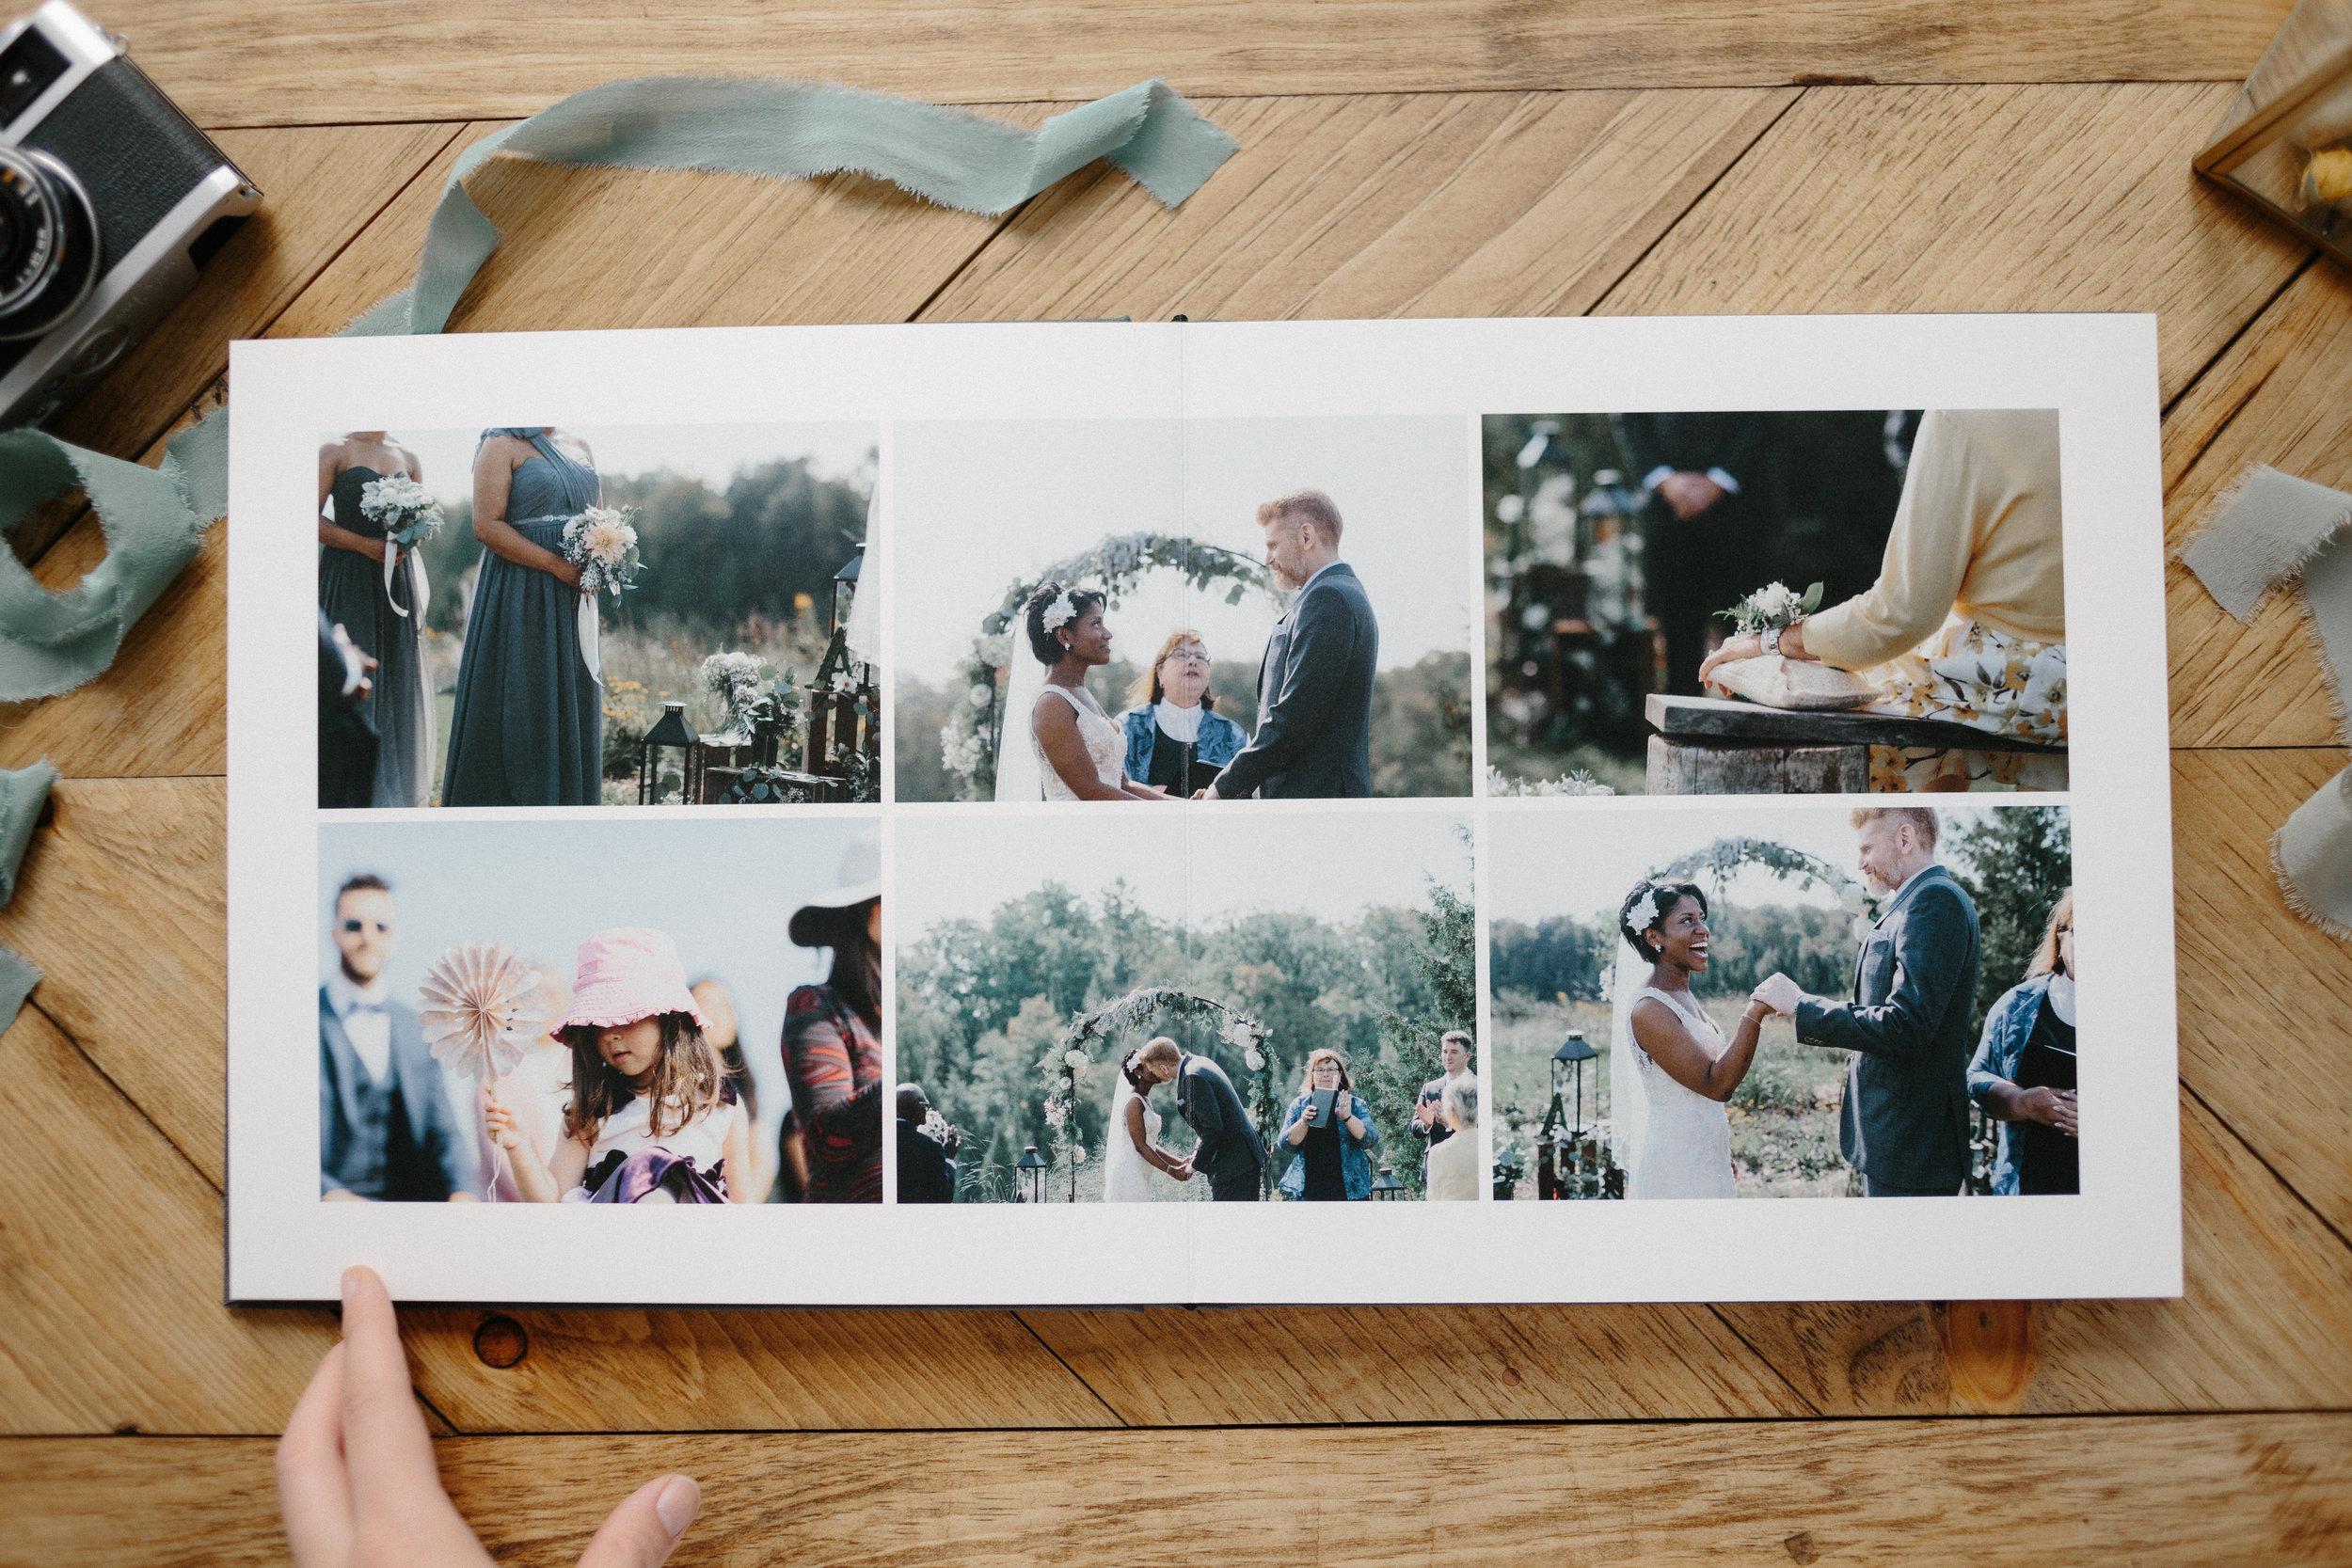 ryanne-hollies-photography-wedding-album-design-details-tono-and-co-artifact-uprising-86.jpg